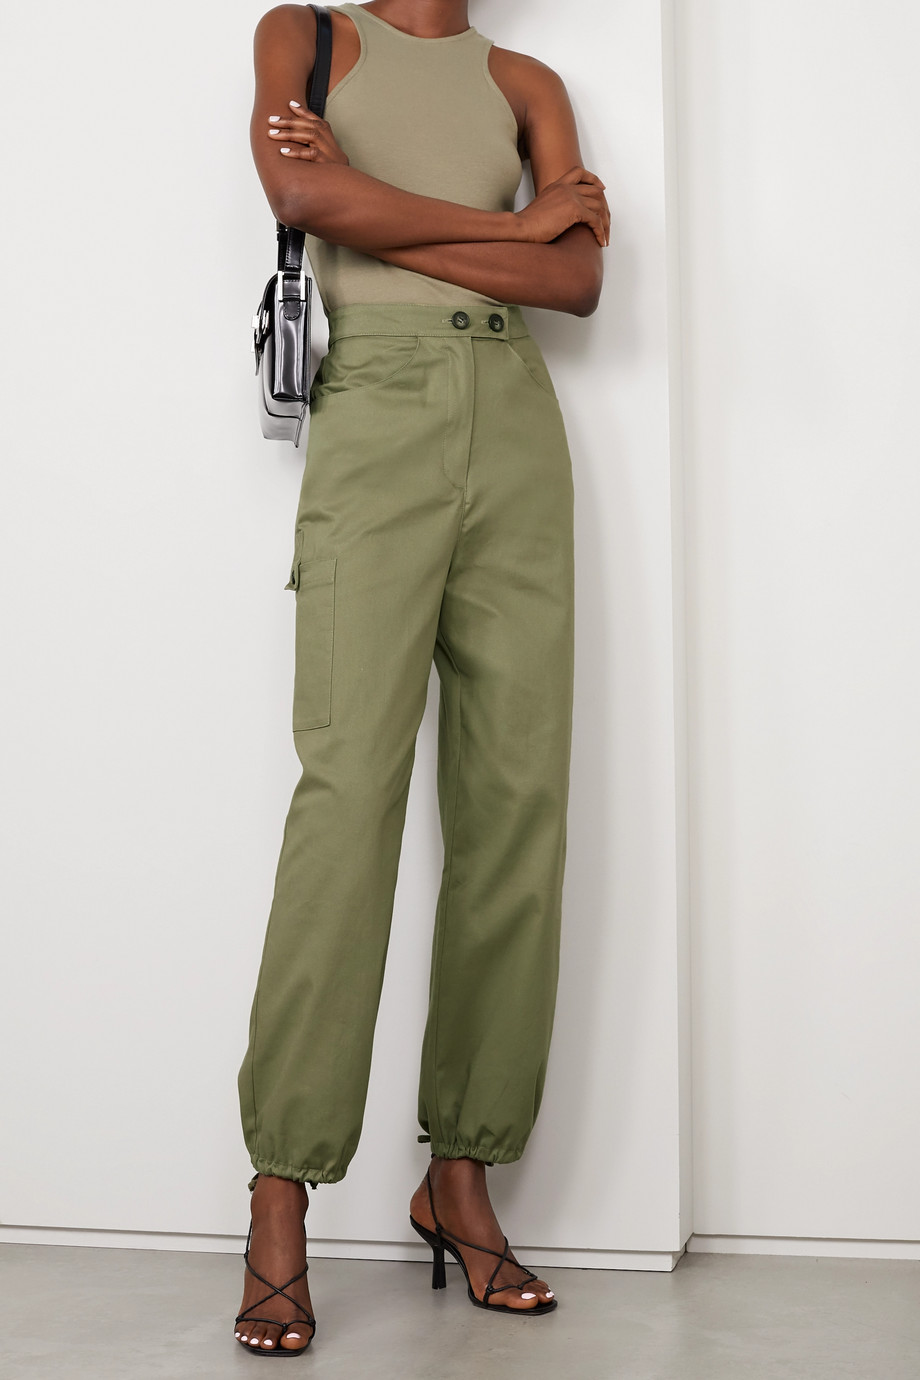 The Range Cotton-blend twill cargo pants